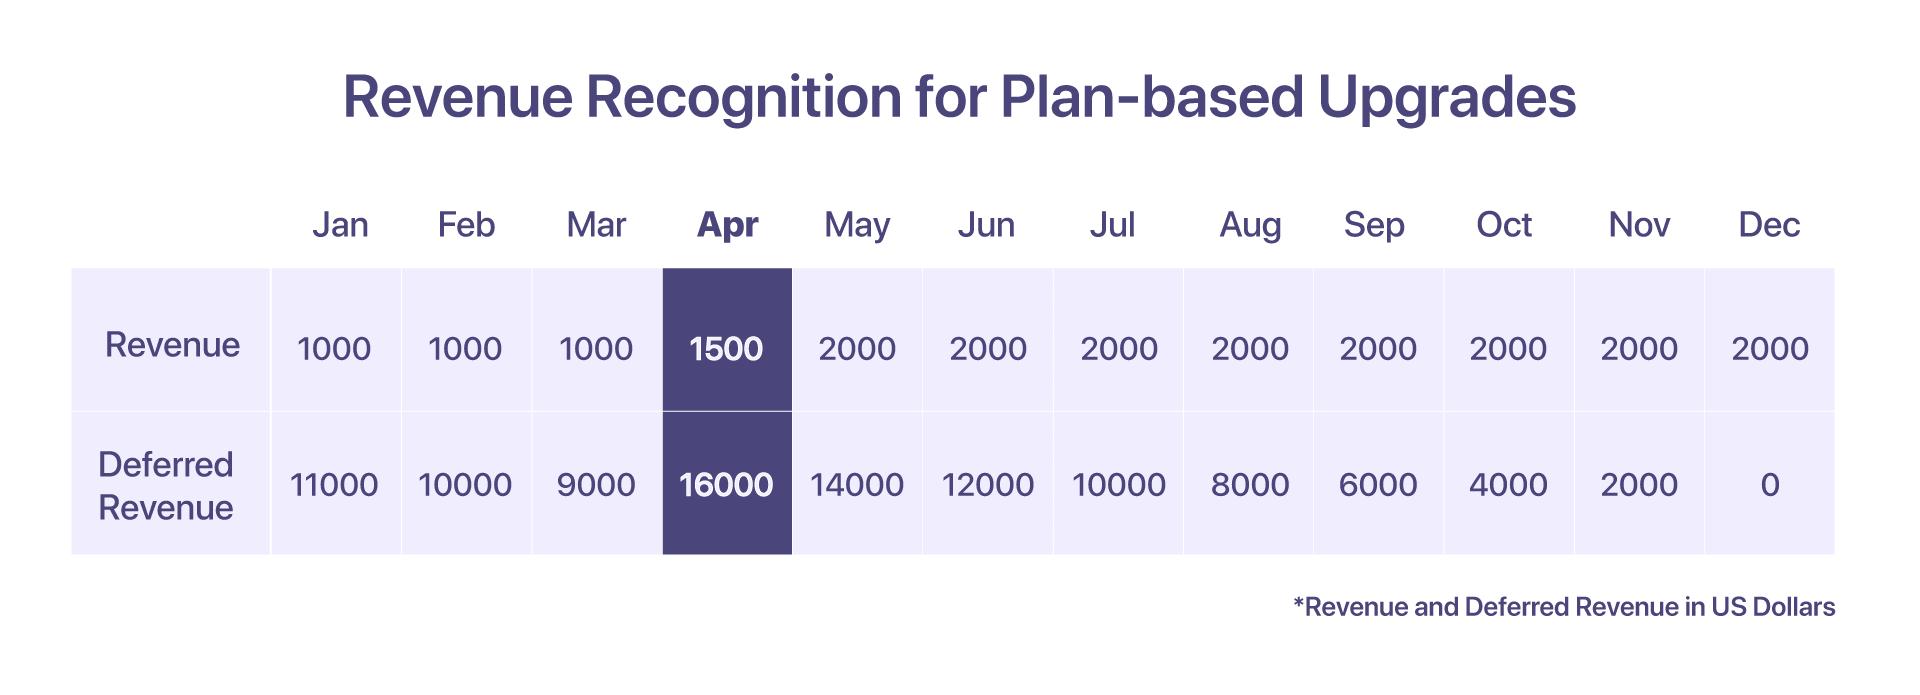 revenue recognition for plan-based upgrades